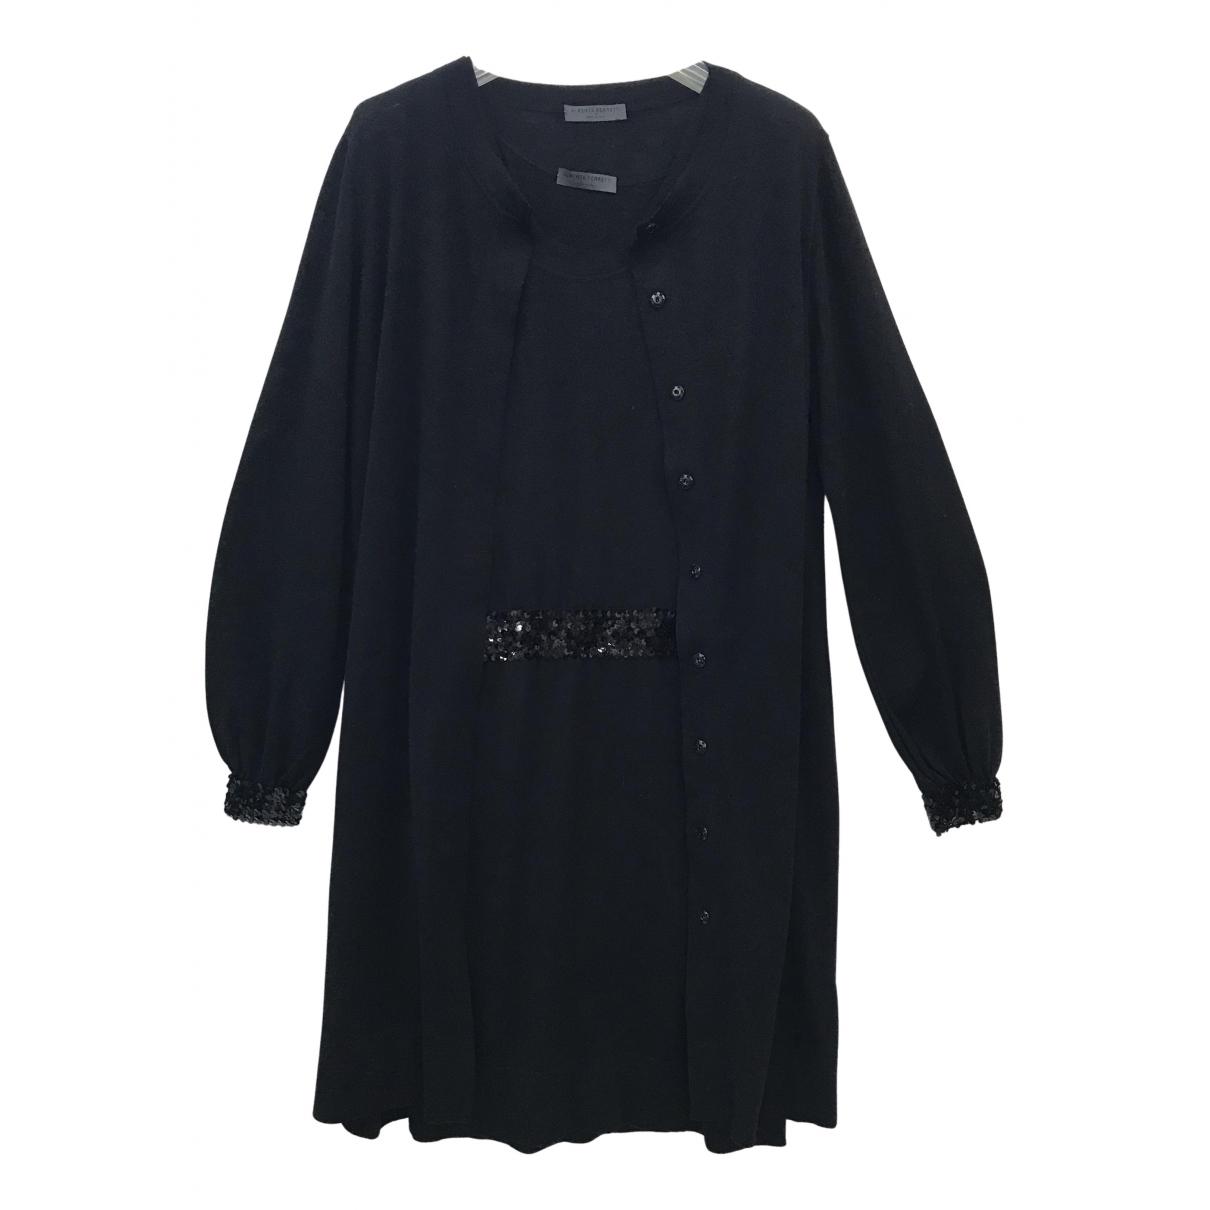 Alberta Ferretti \N Kleid in  Schwarz Wolle